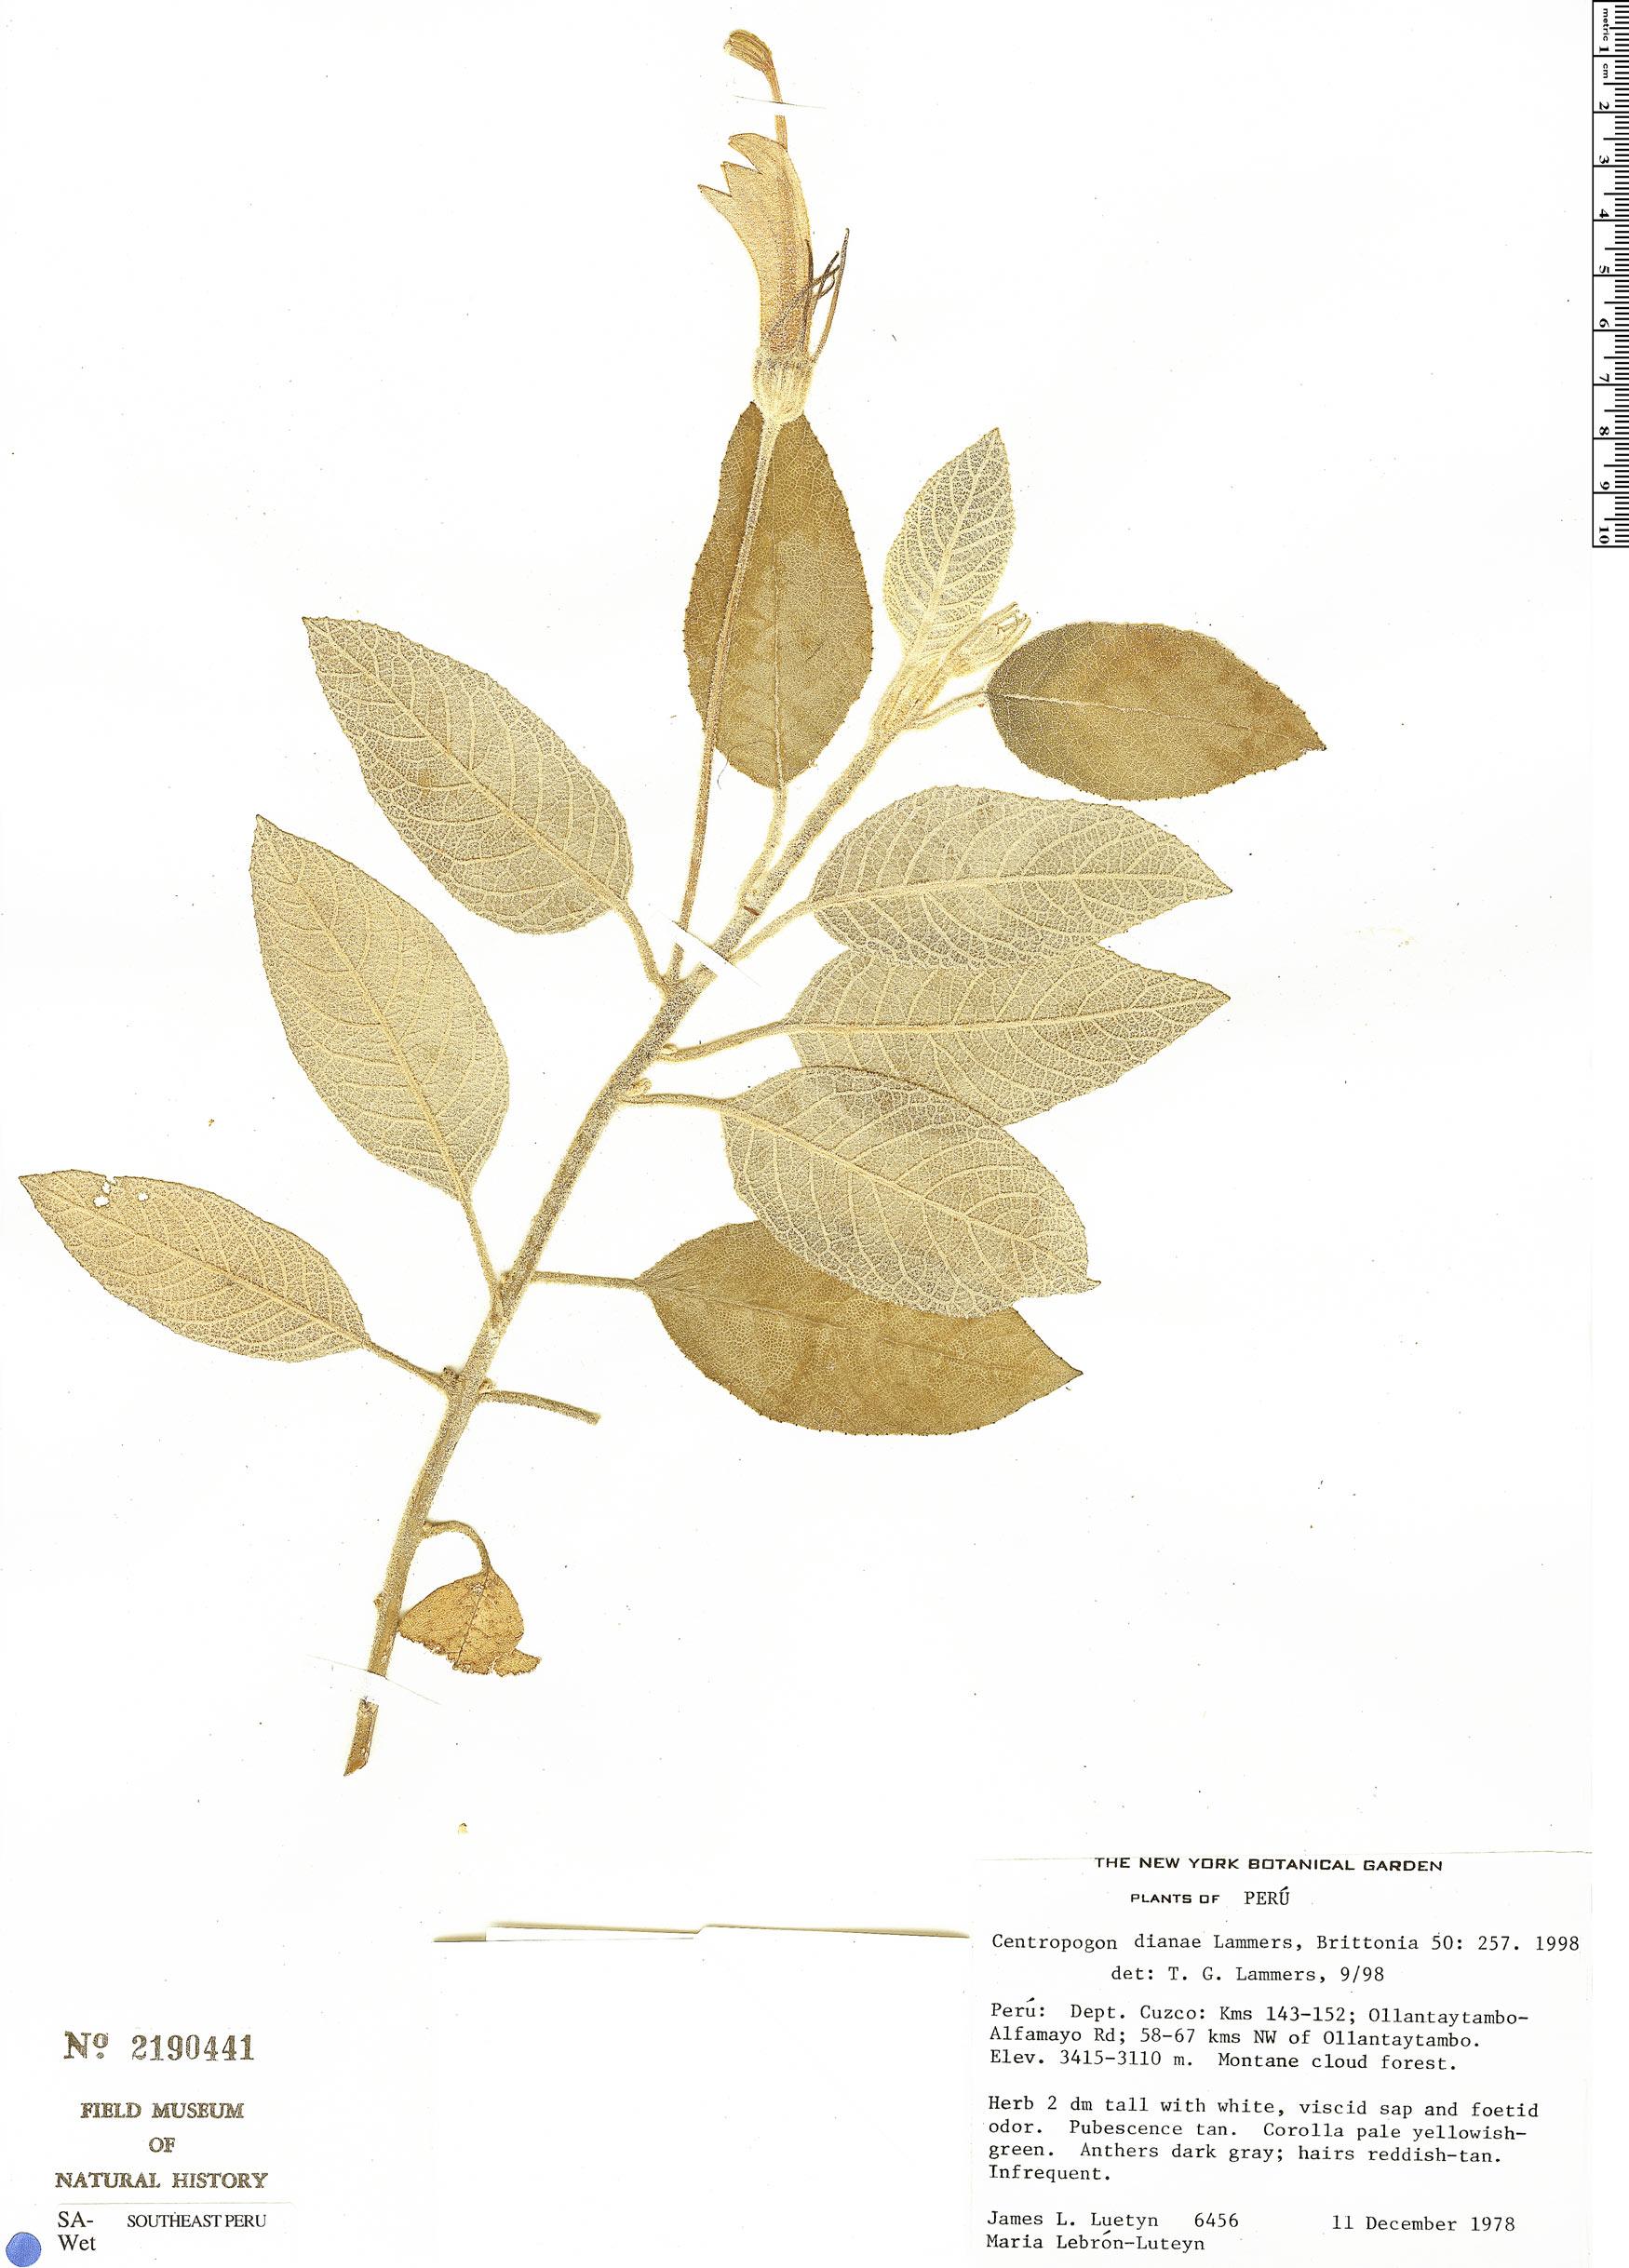 Specimen: Centropogon dianae